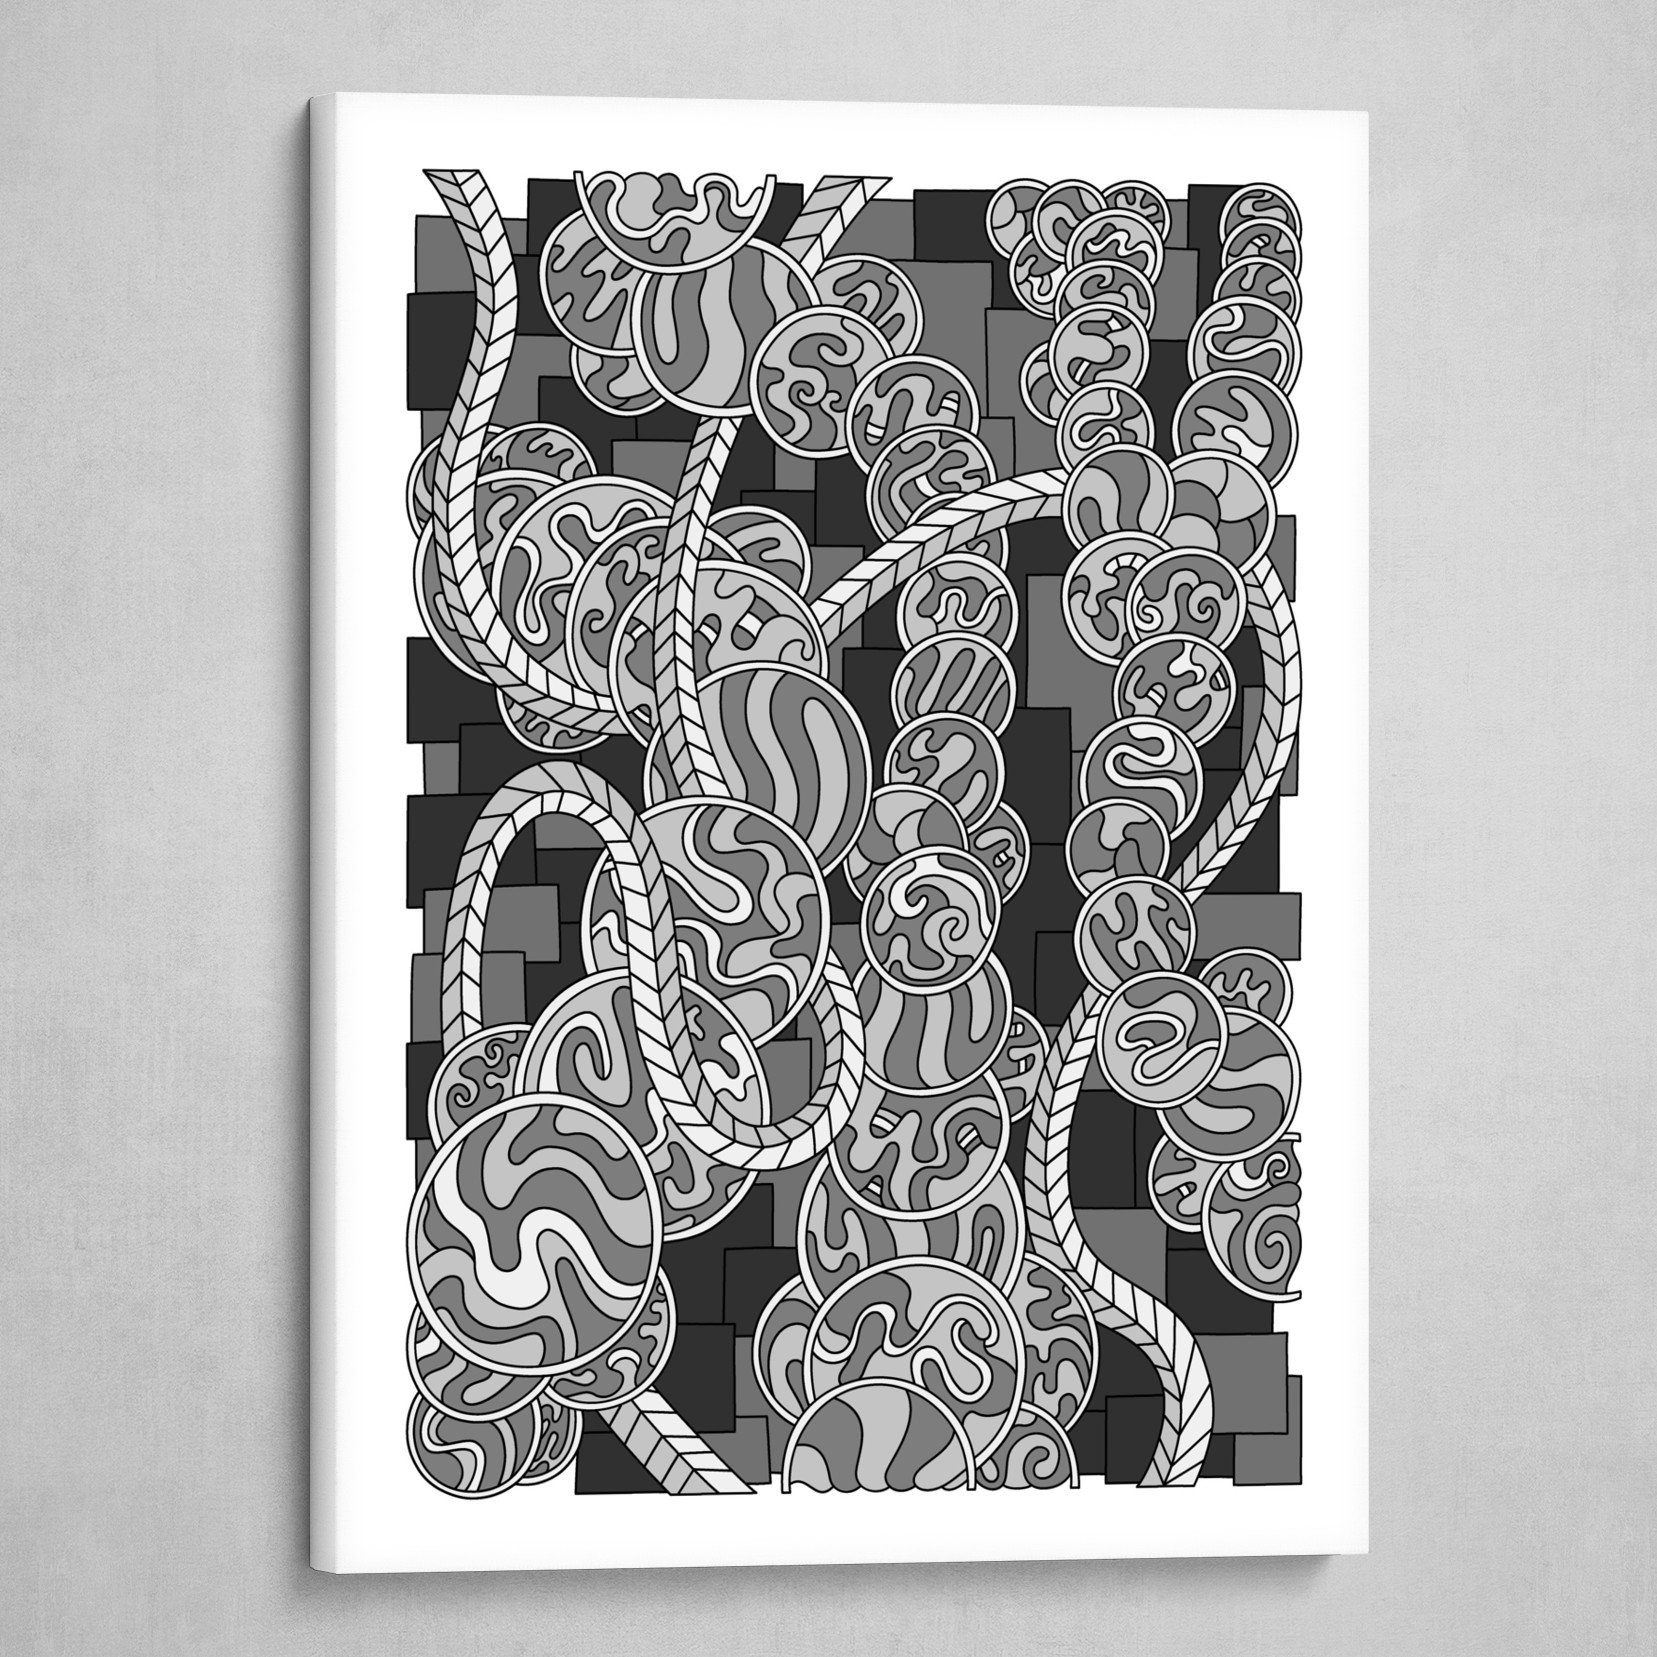 Wandering 43: grayscale